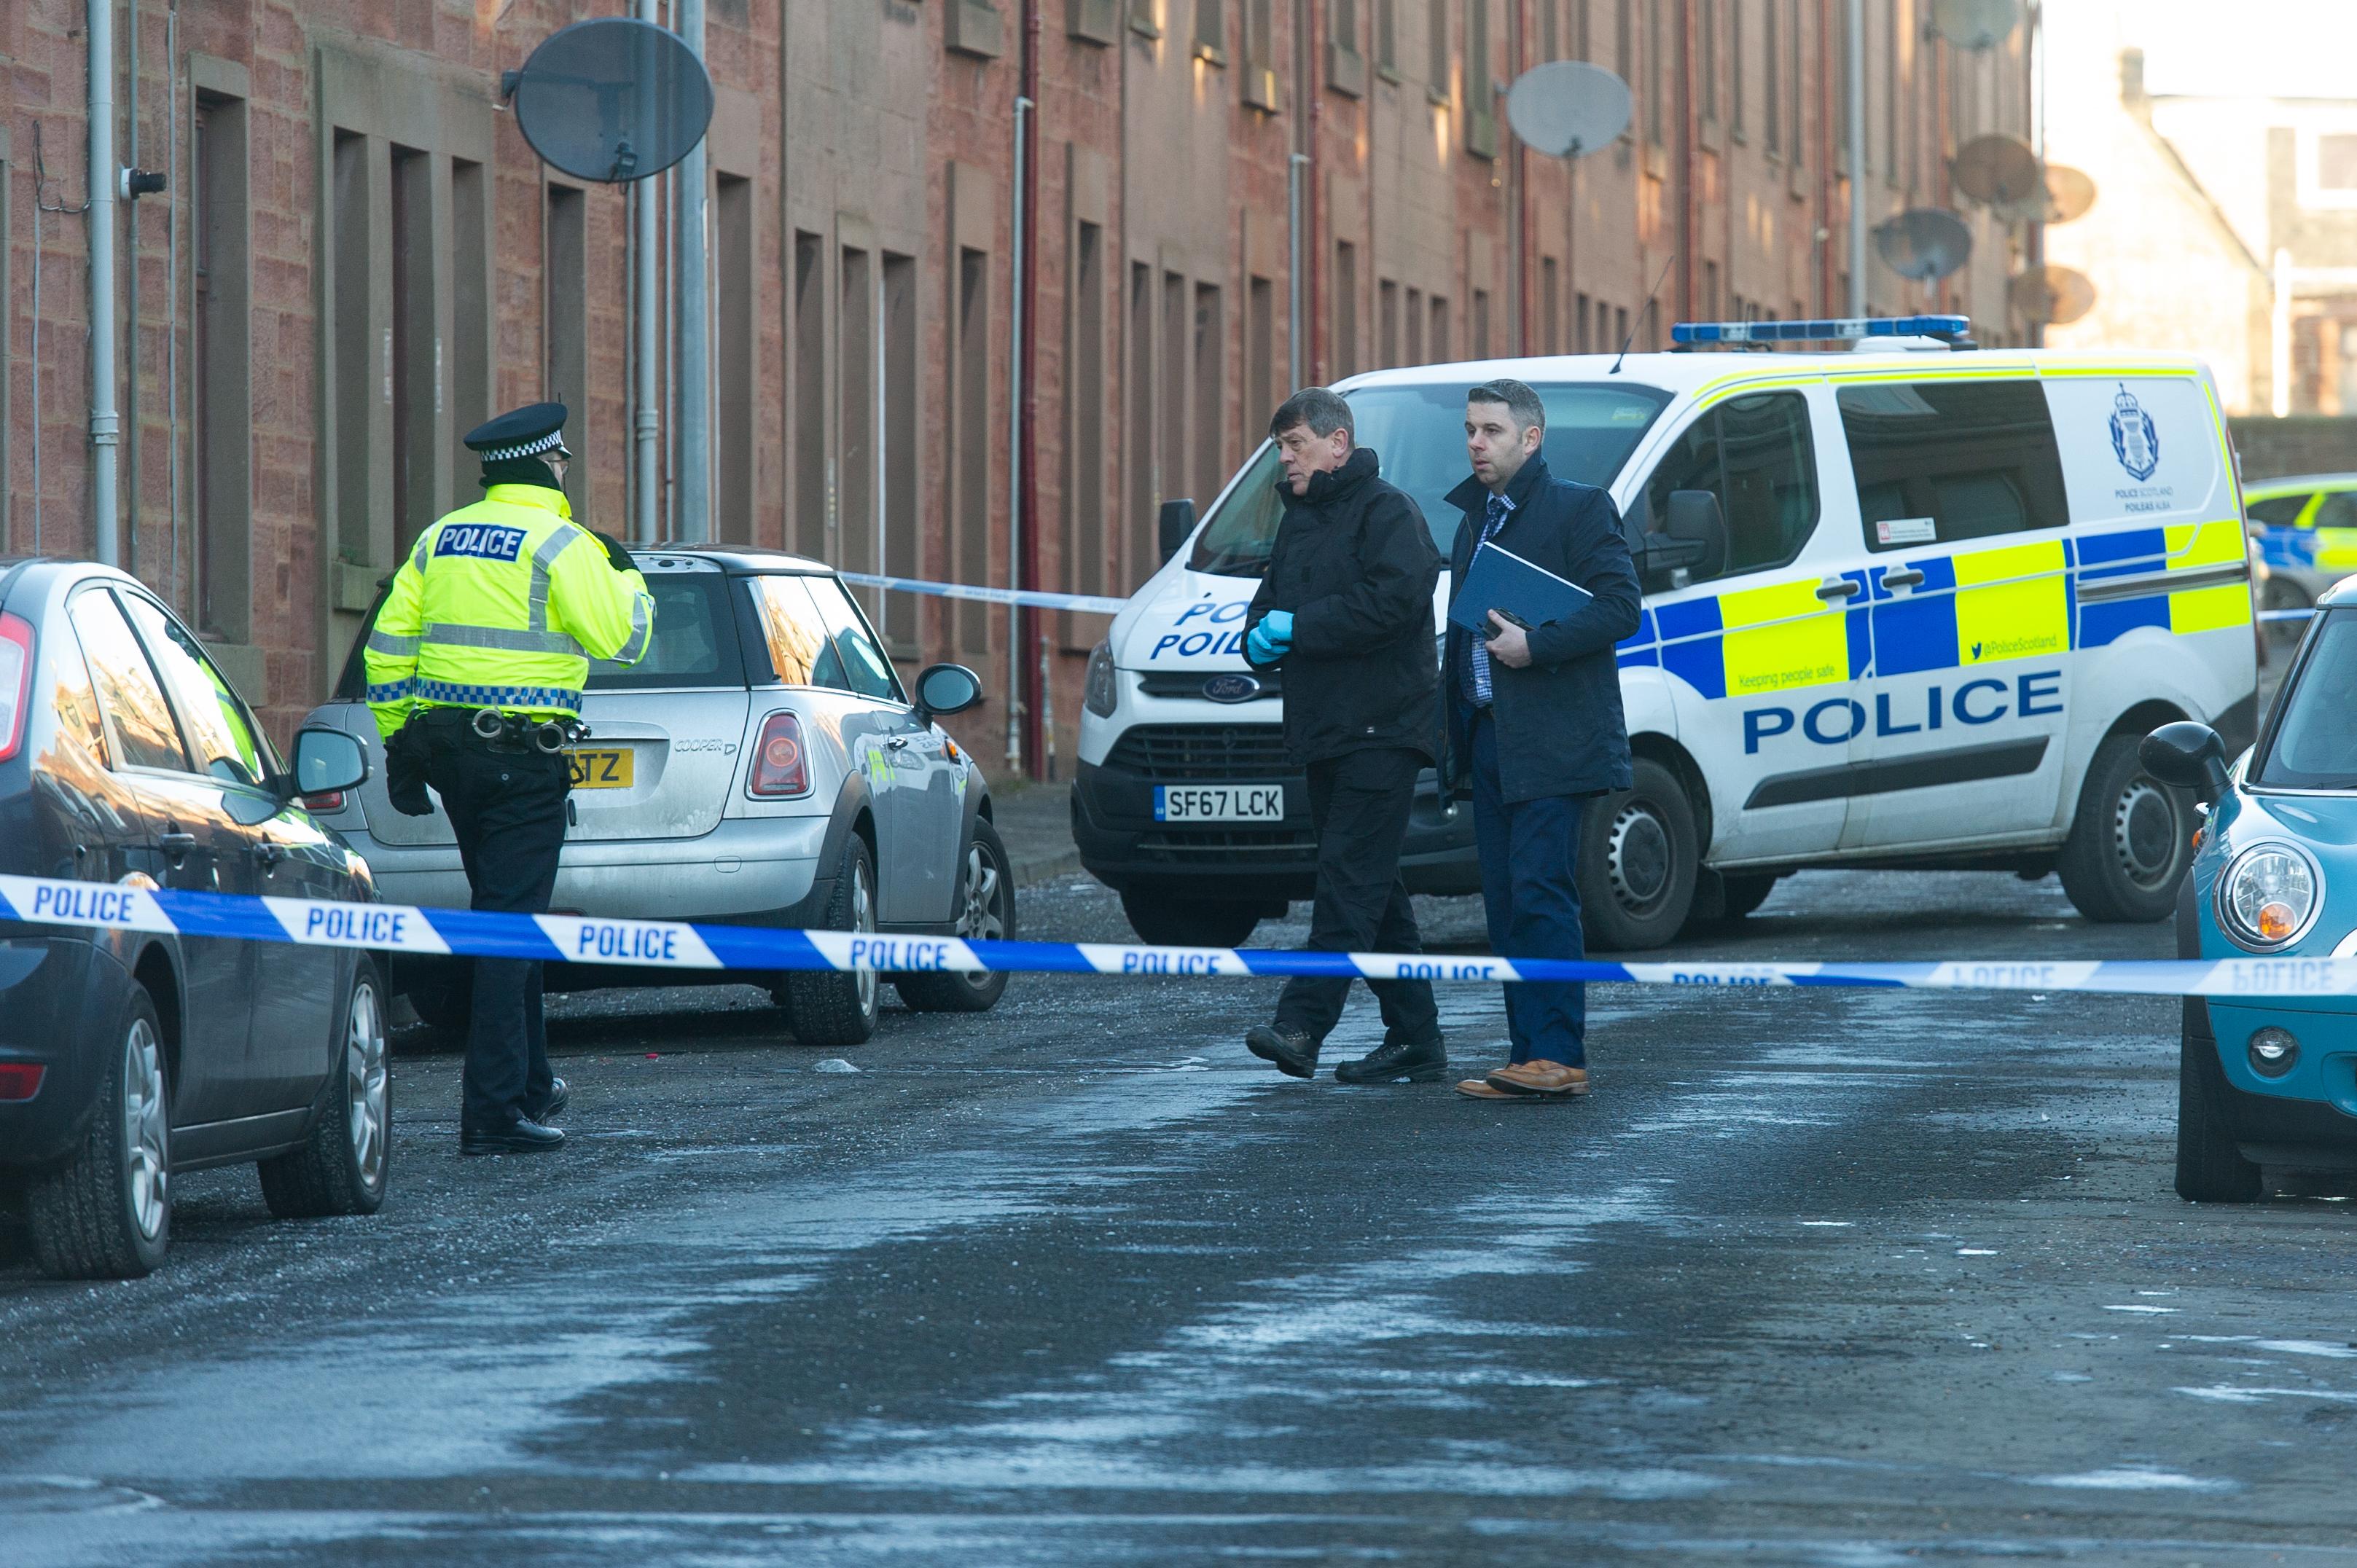 The major police activity in Sidney Street, Arbroath.